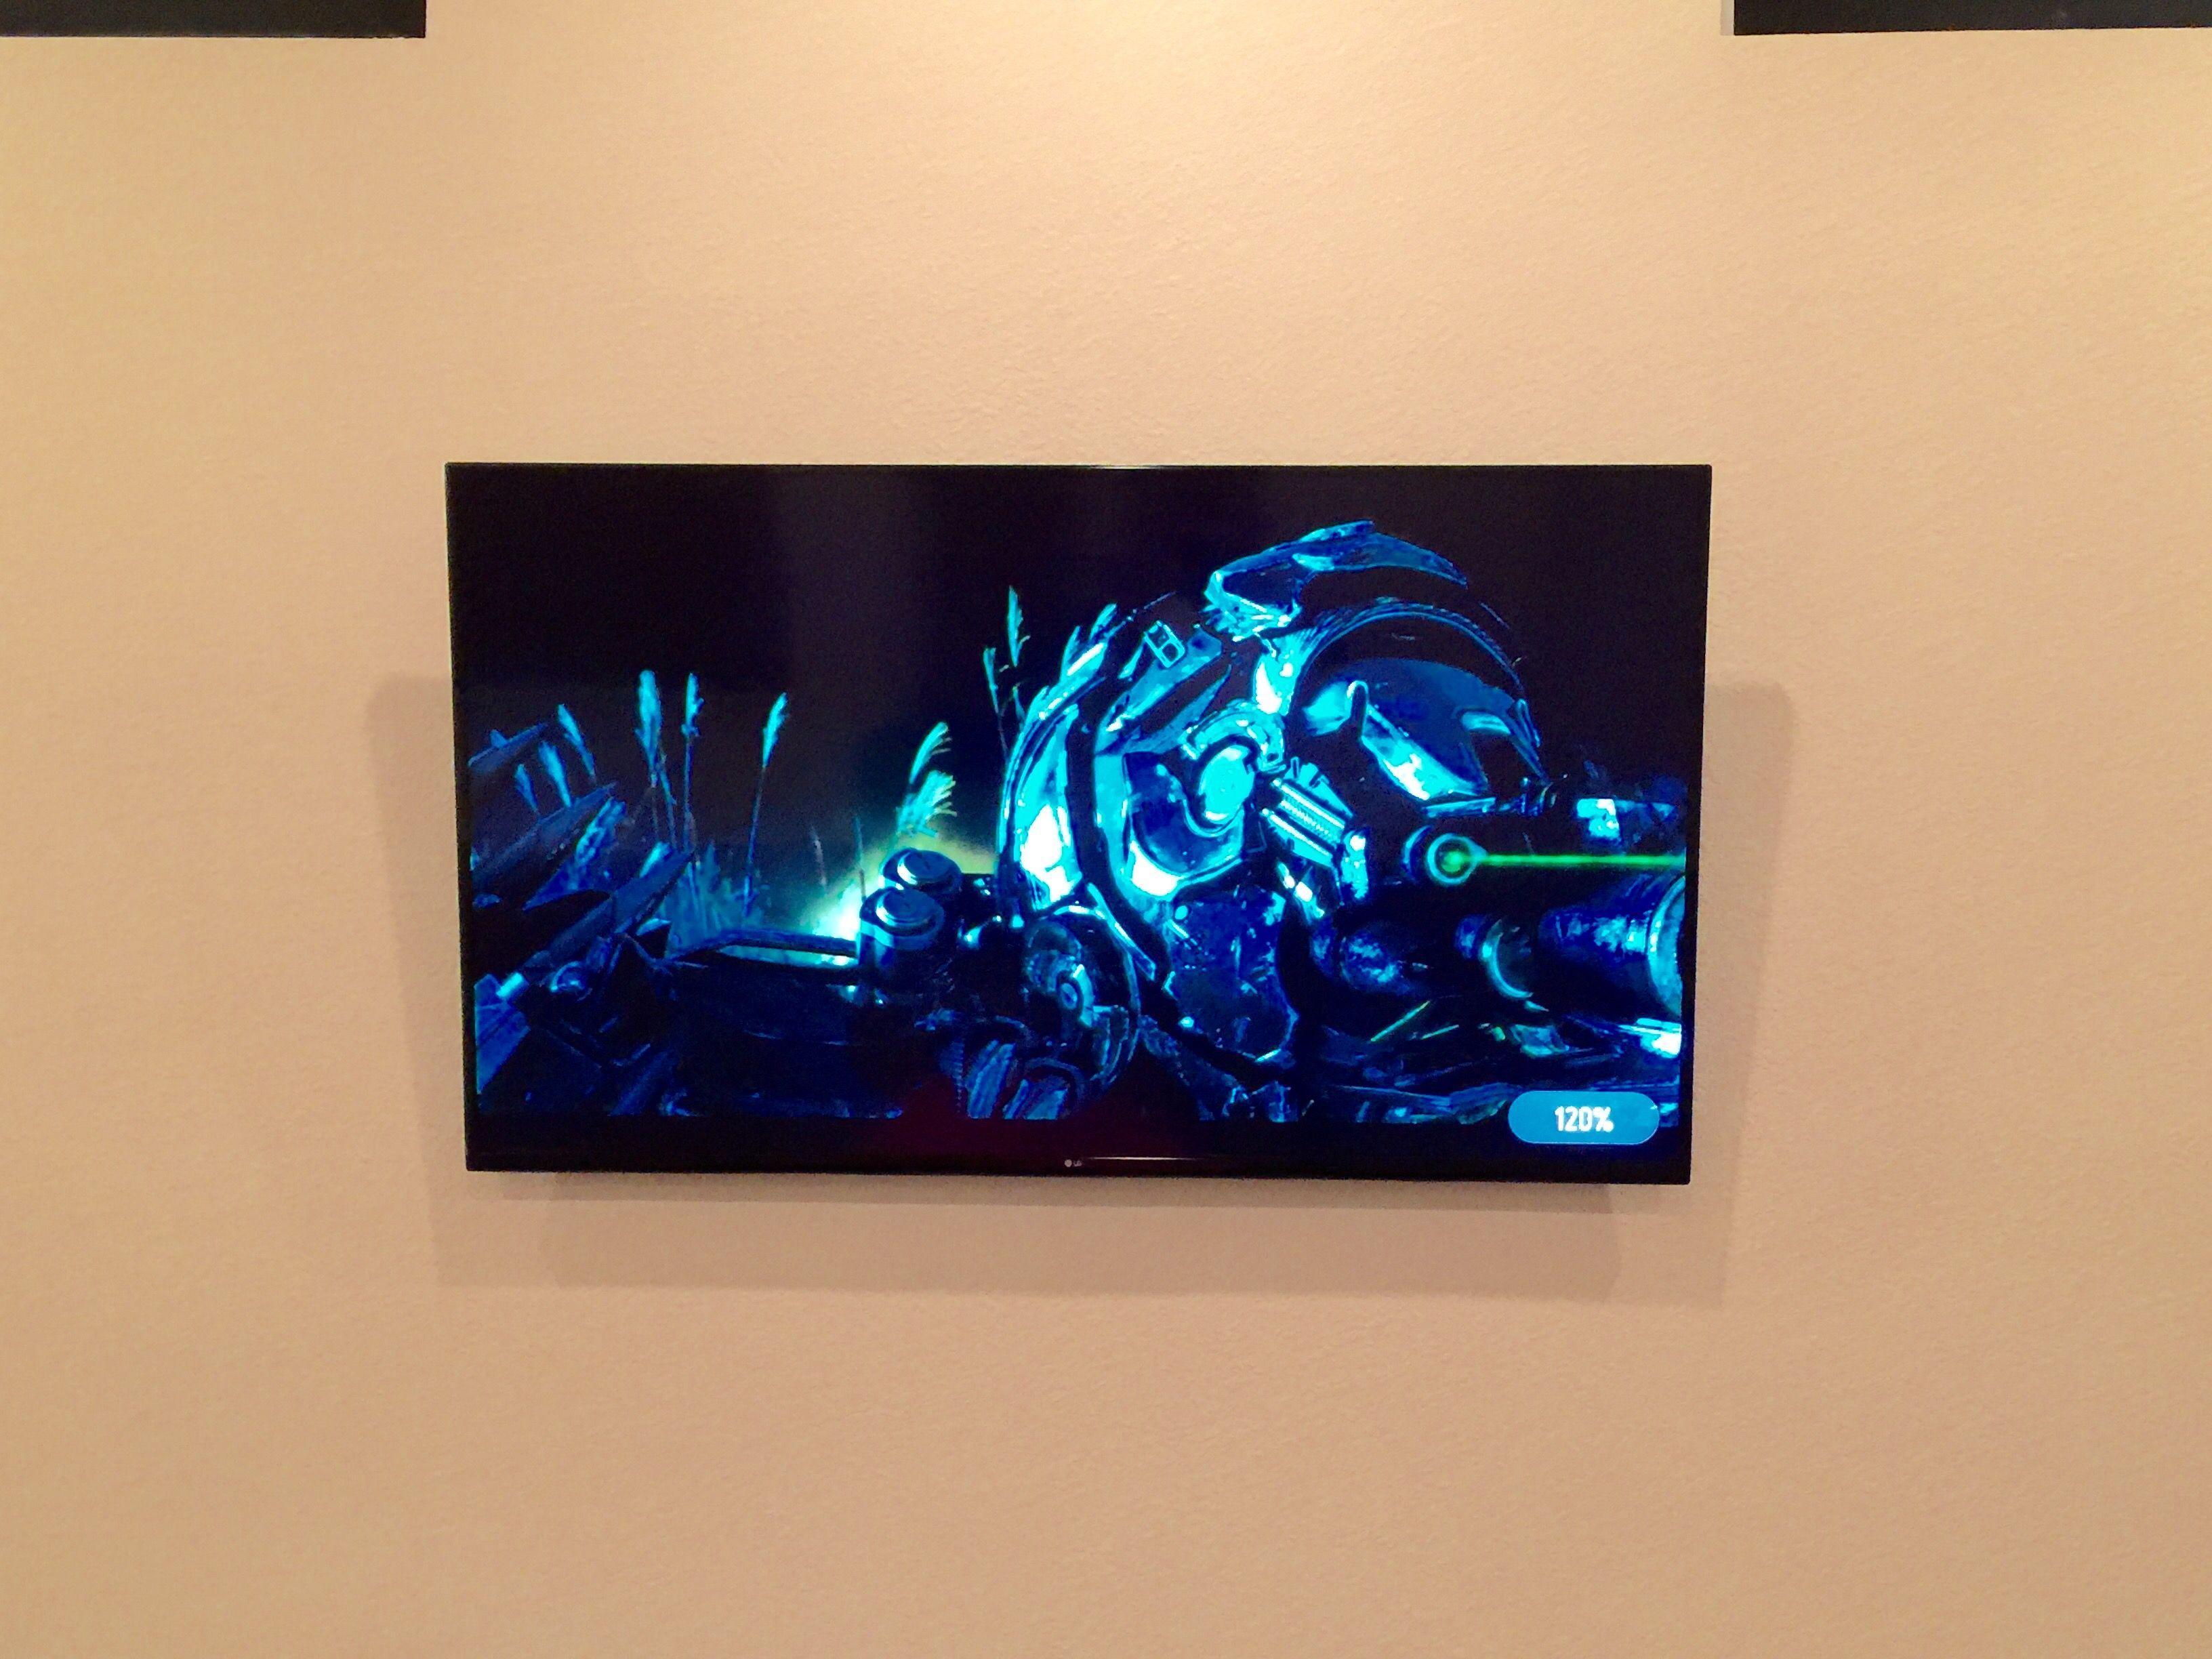 "75"" LG Smart LED TV on a Tilt Mount Wires Hidden in Wall"